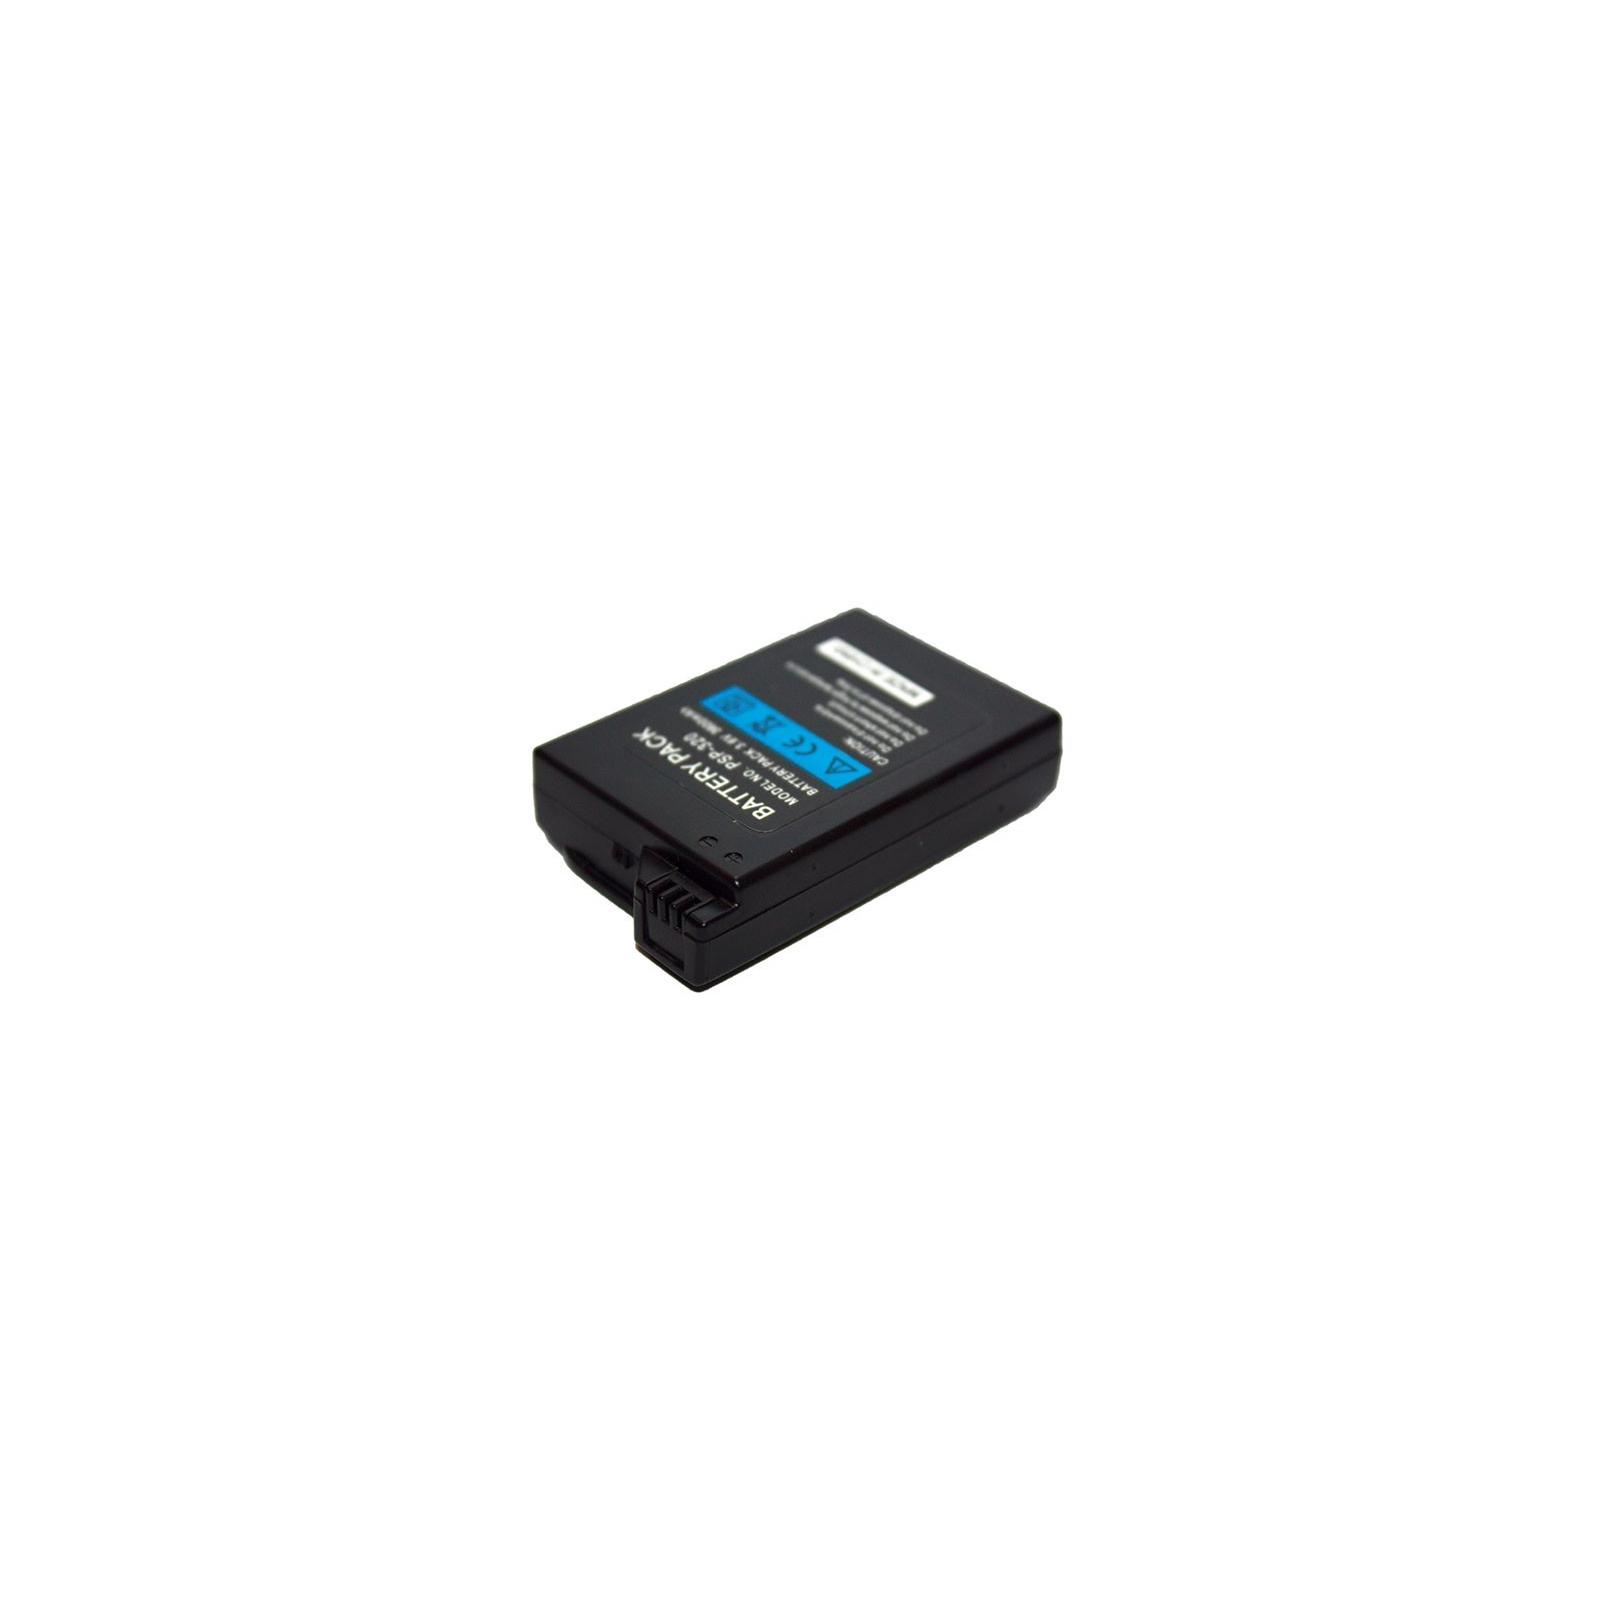 Аккумулятор к фото/видео EXTRADIGITAL Sony PSP-110 (DV00DV1351) изображение 2